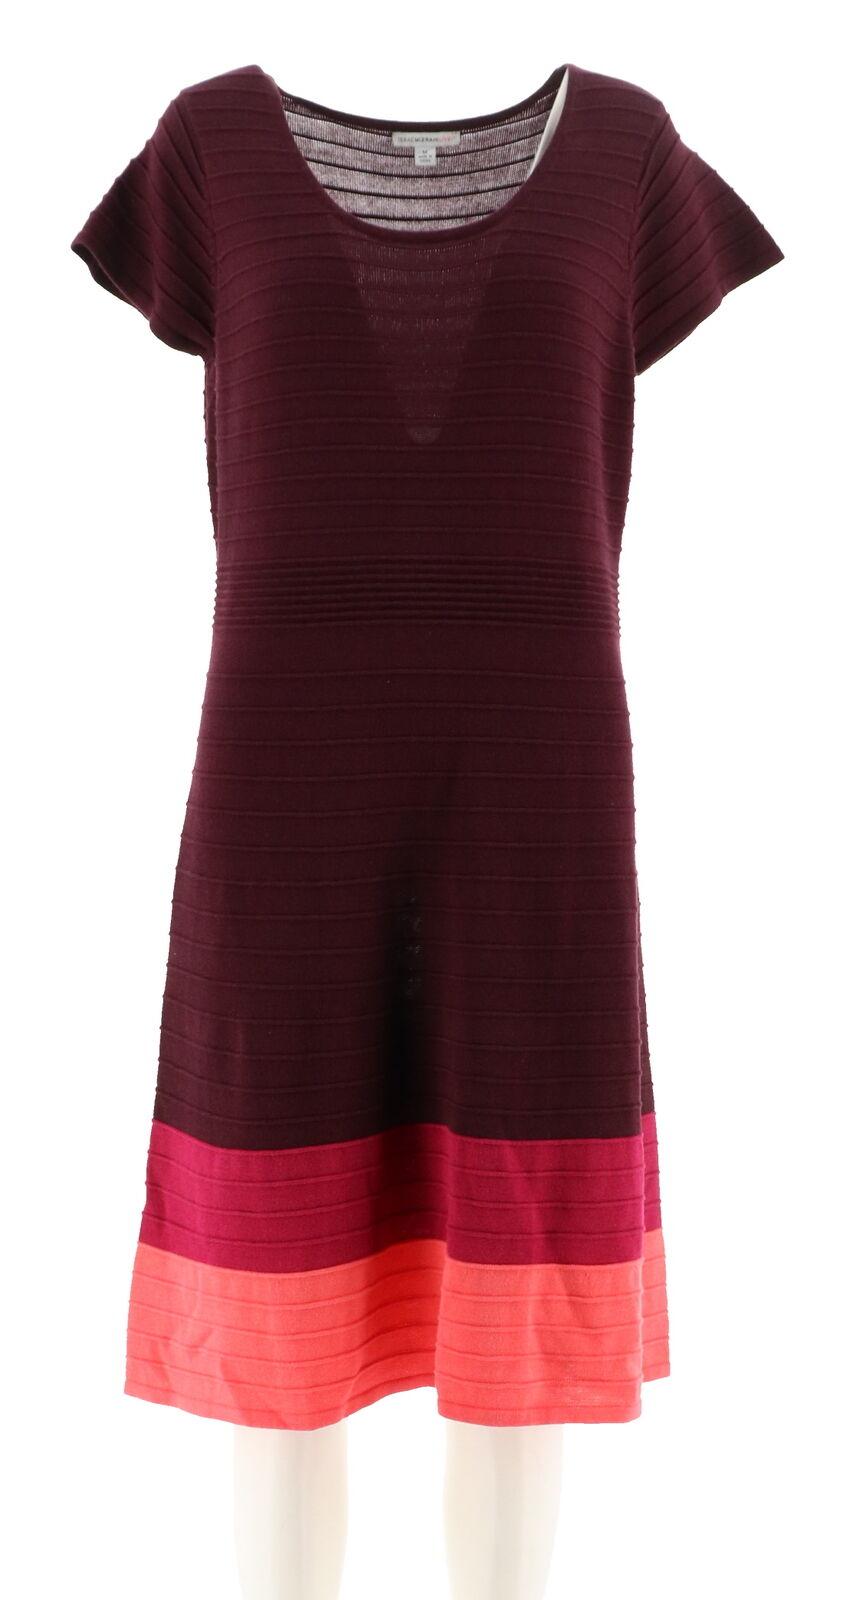 Isaac Mizrahi Strukturiert Farbblock Pullover Kleid Tief Tief Tief Burgunderrot GR. M NEU b5a23a